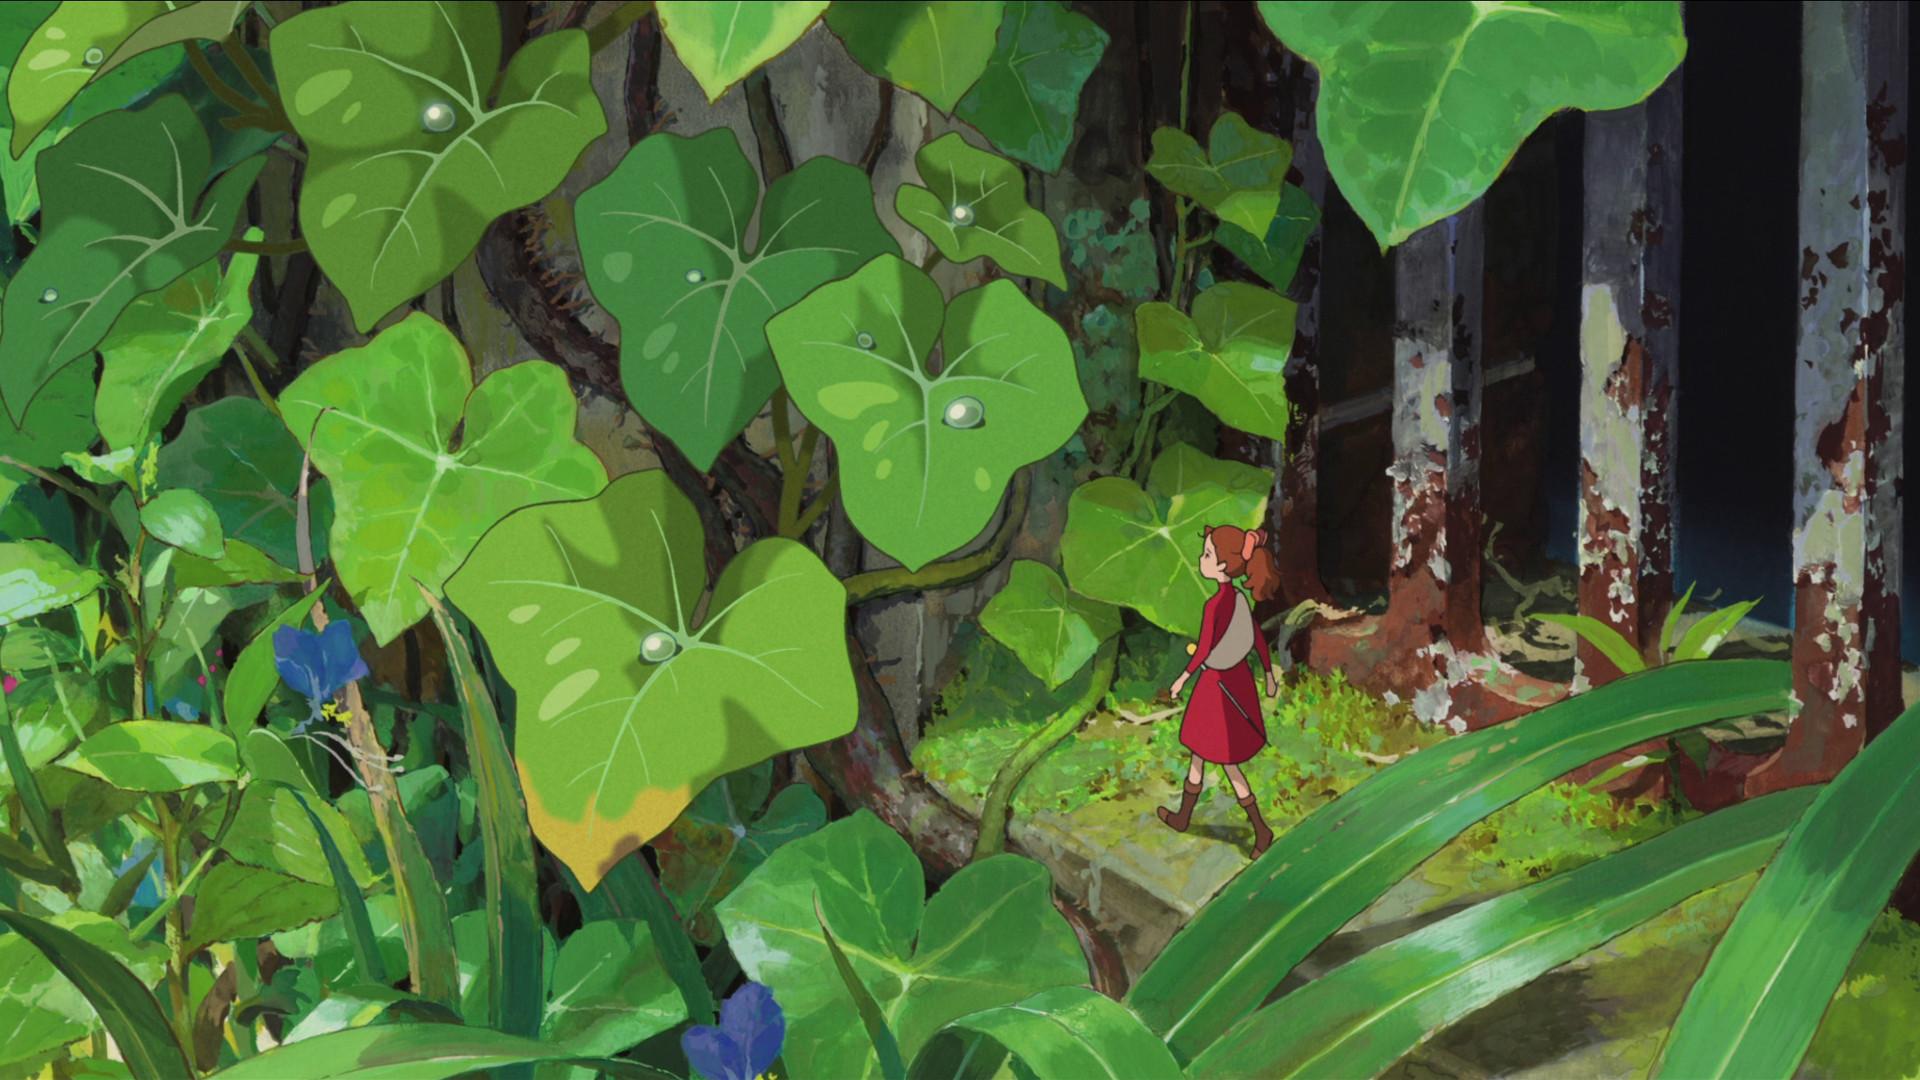 The Secret World of Arrietty Hayao Miyazaki Studio Ghibli Pinte 1920x1080